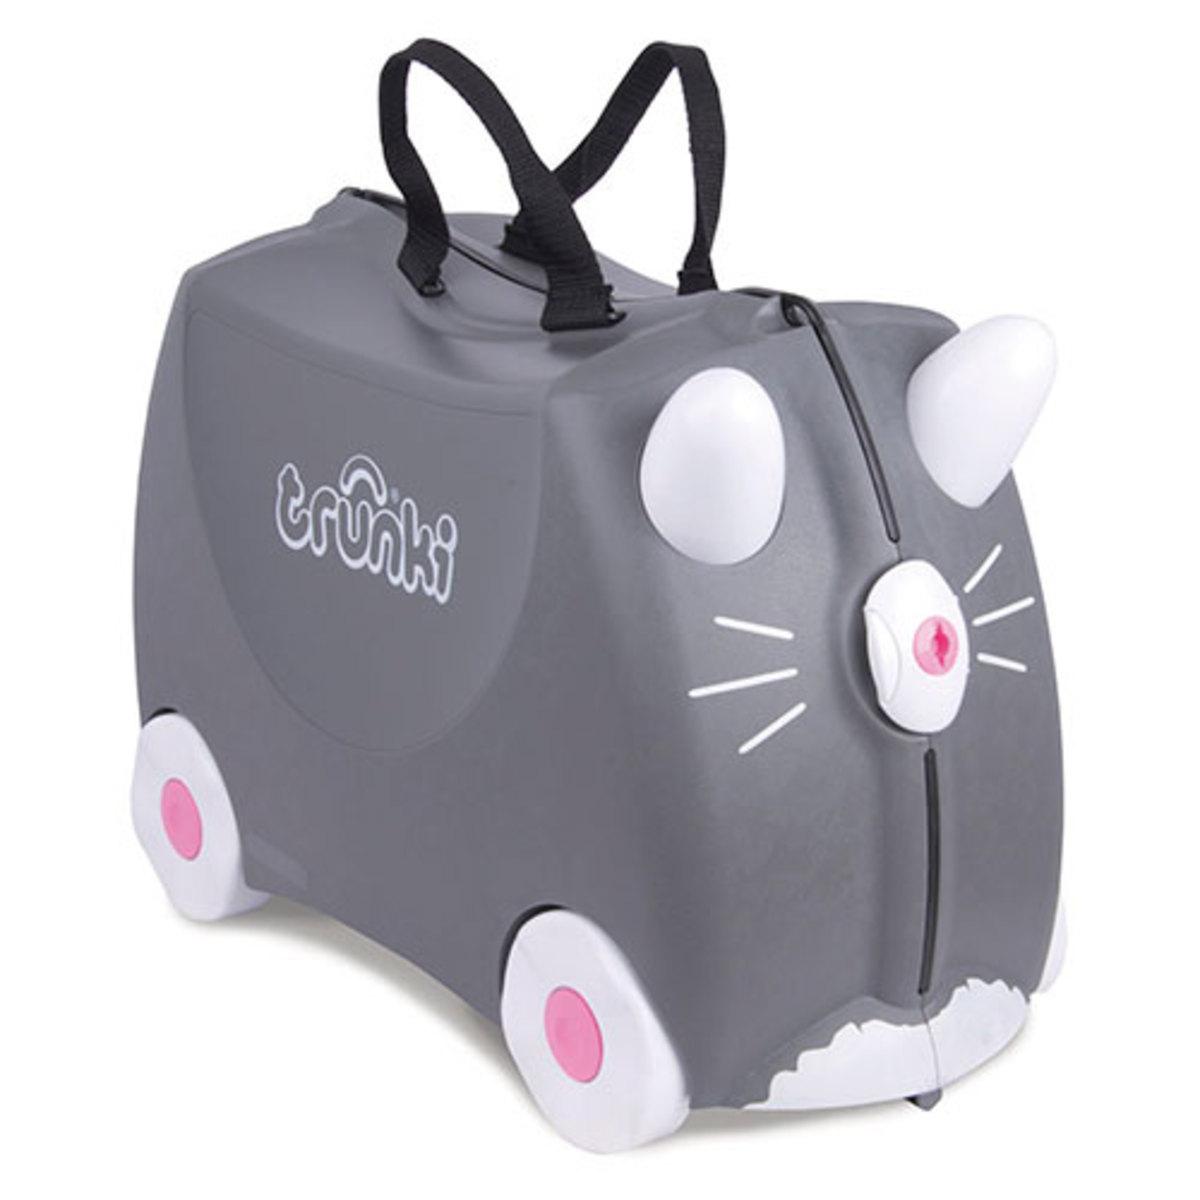 trunki valise chat benny bagagerie enfant trunki sur l 39 armoire de b b. Black Bedroom Furniture Sets. Home Design Ideas